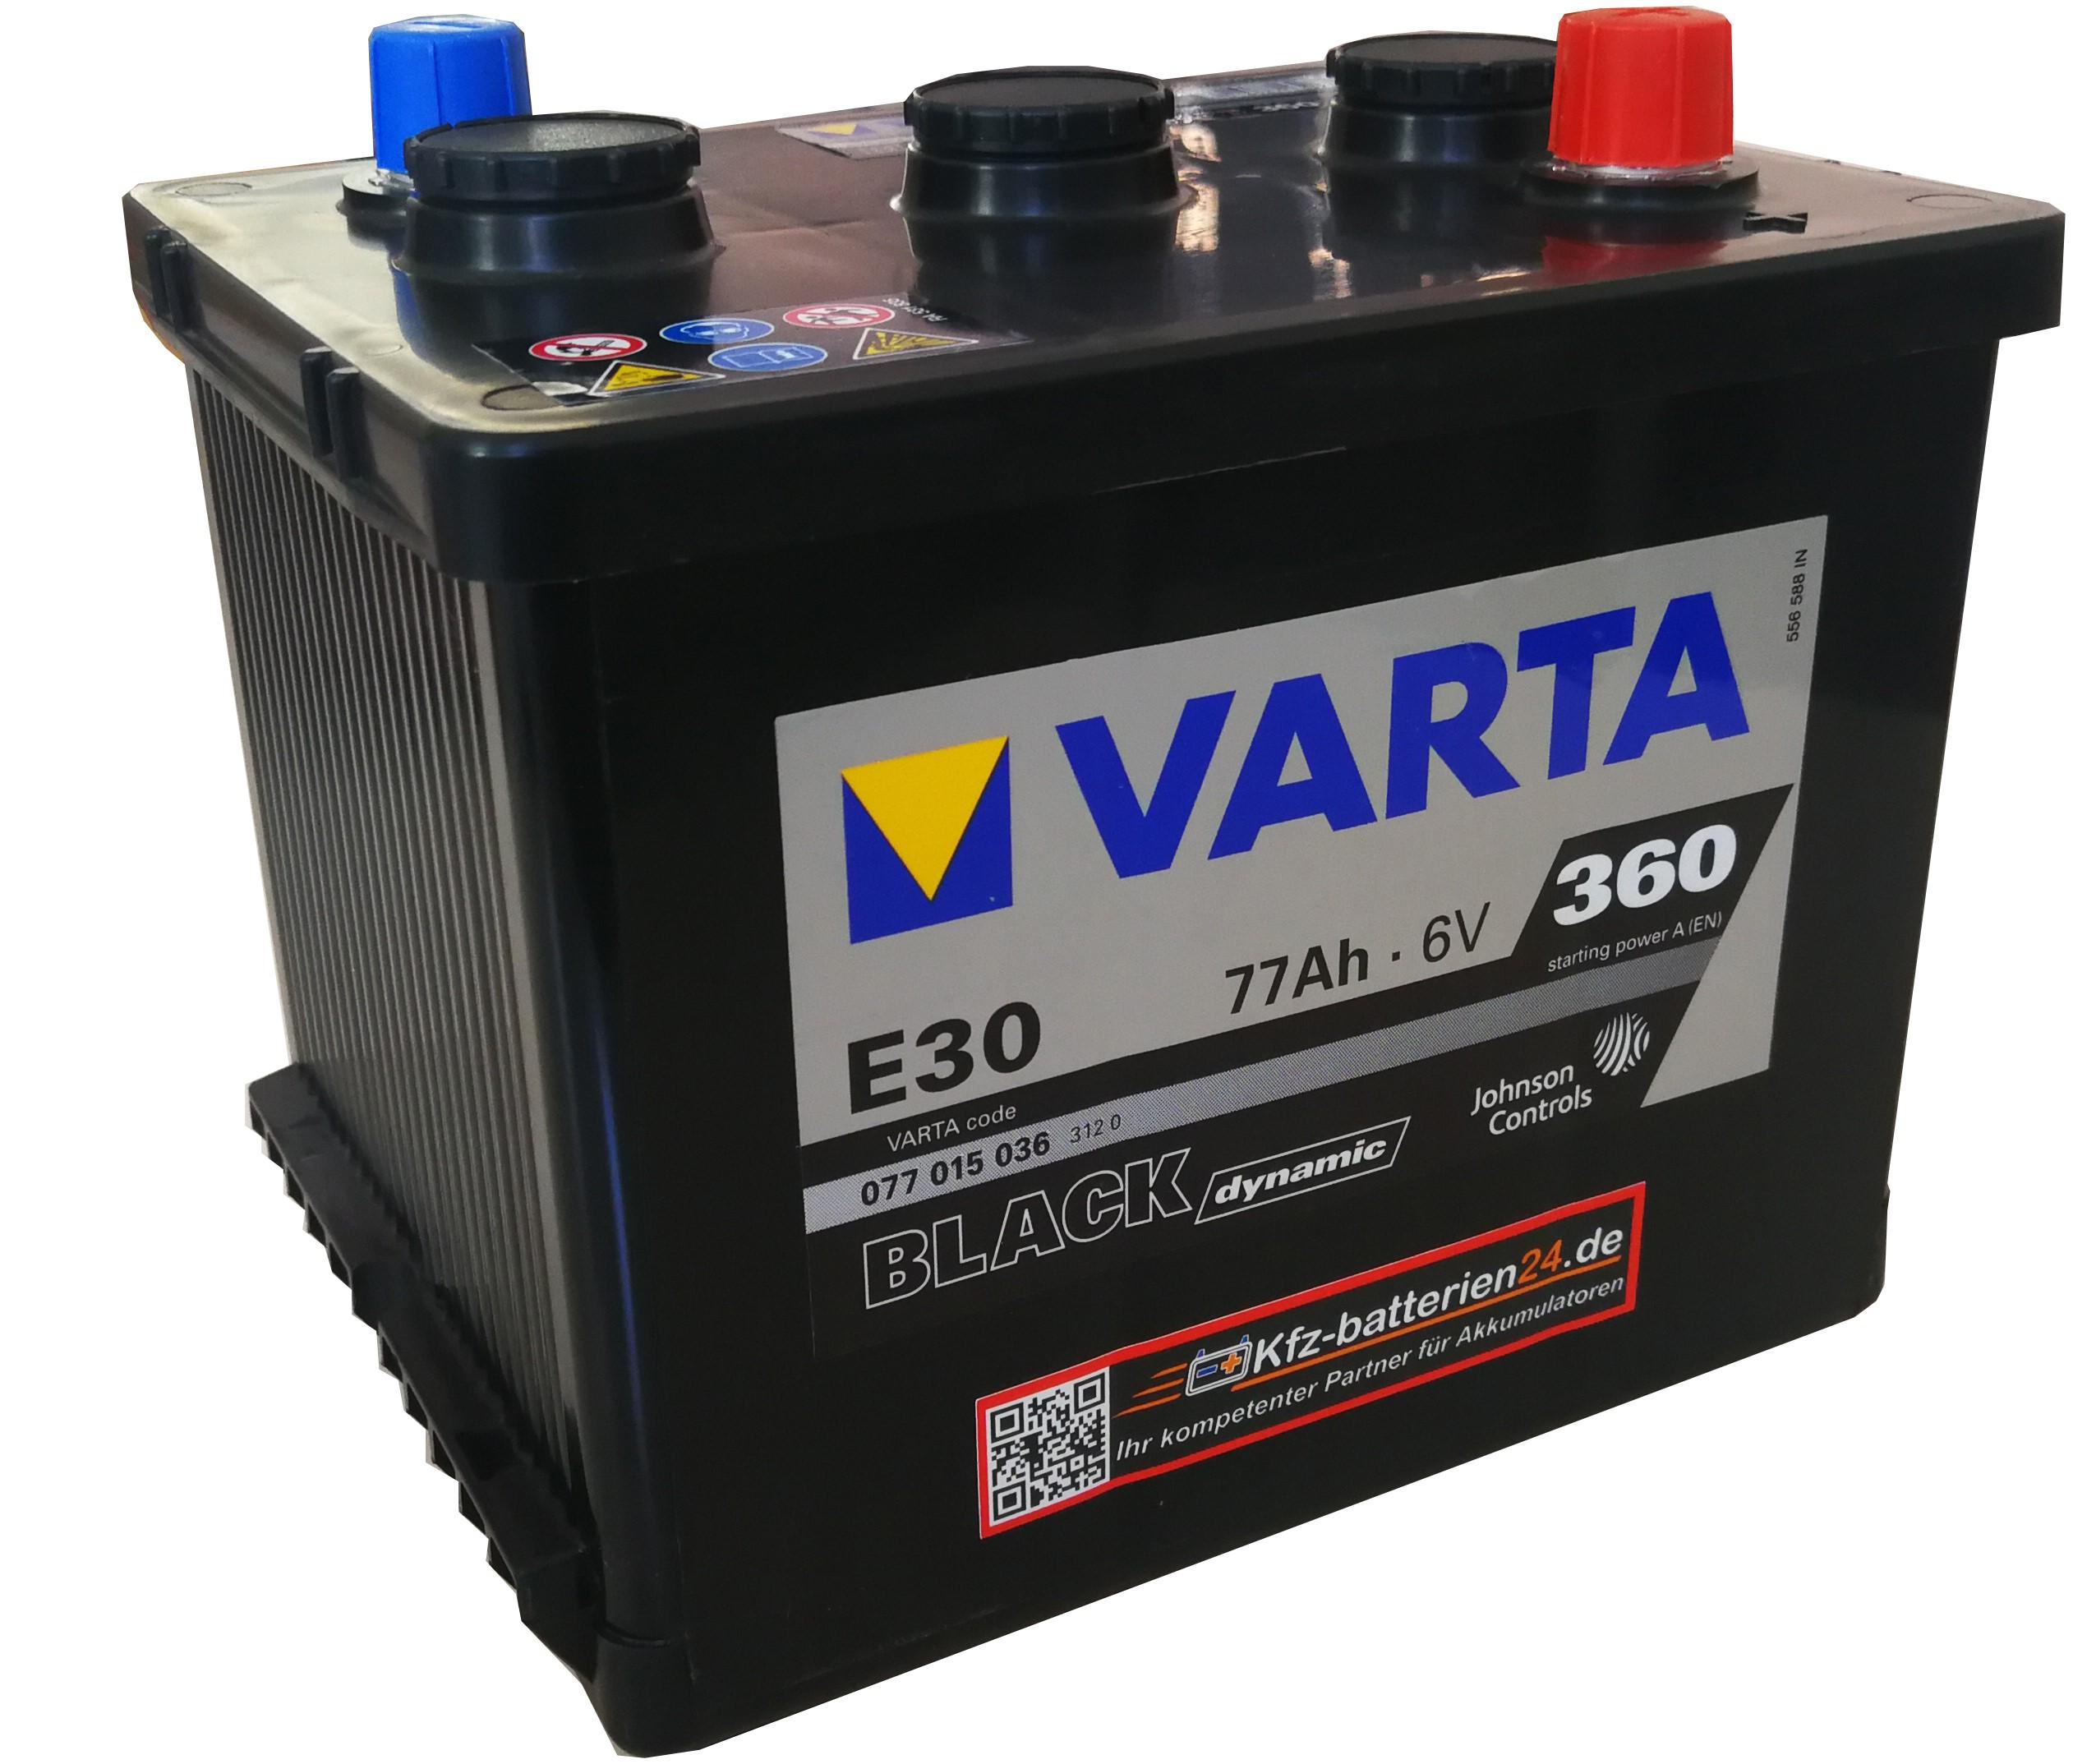 Varta Black Dynamic 077015036 6V 77Ah 360A